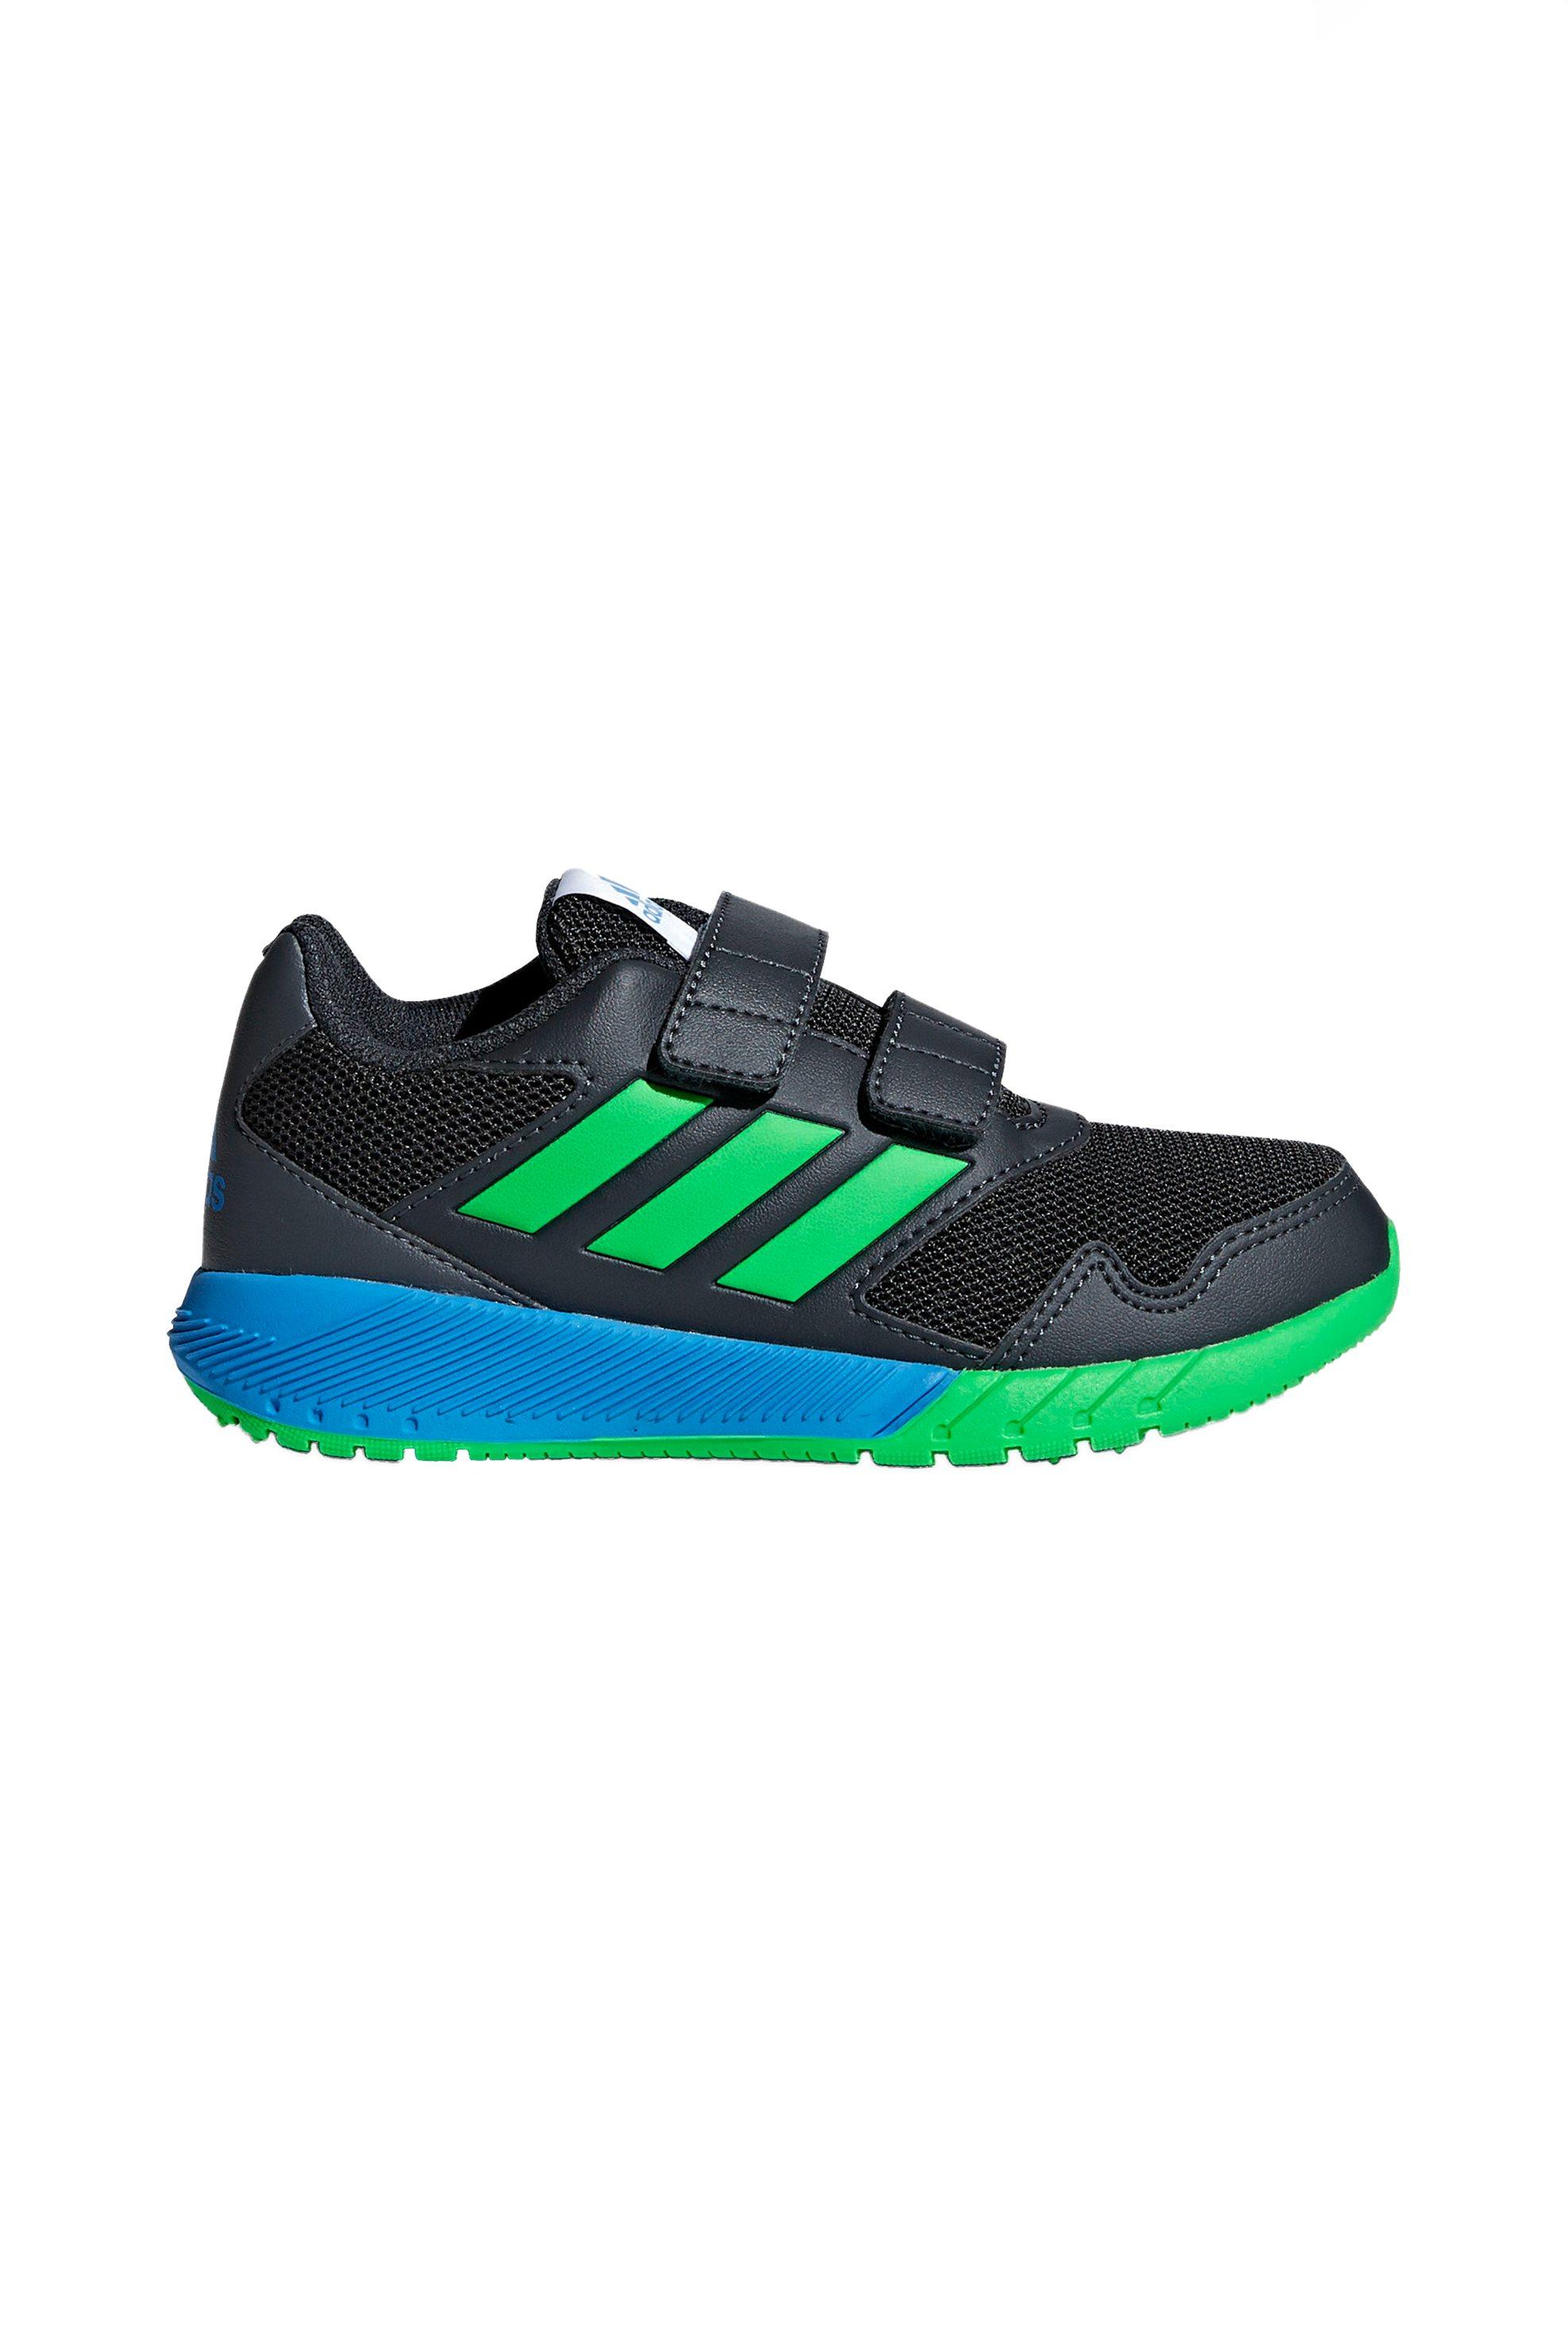 -30% Notos Adidas παιδικά αθλητικά παπούτσια AltaRun CF K – AH2408 – Μαύρο 96737589eaa